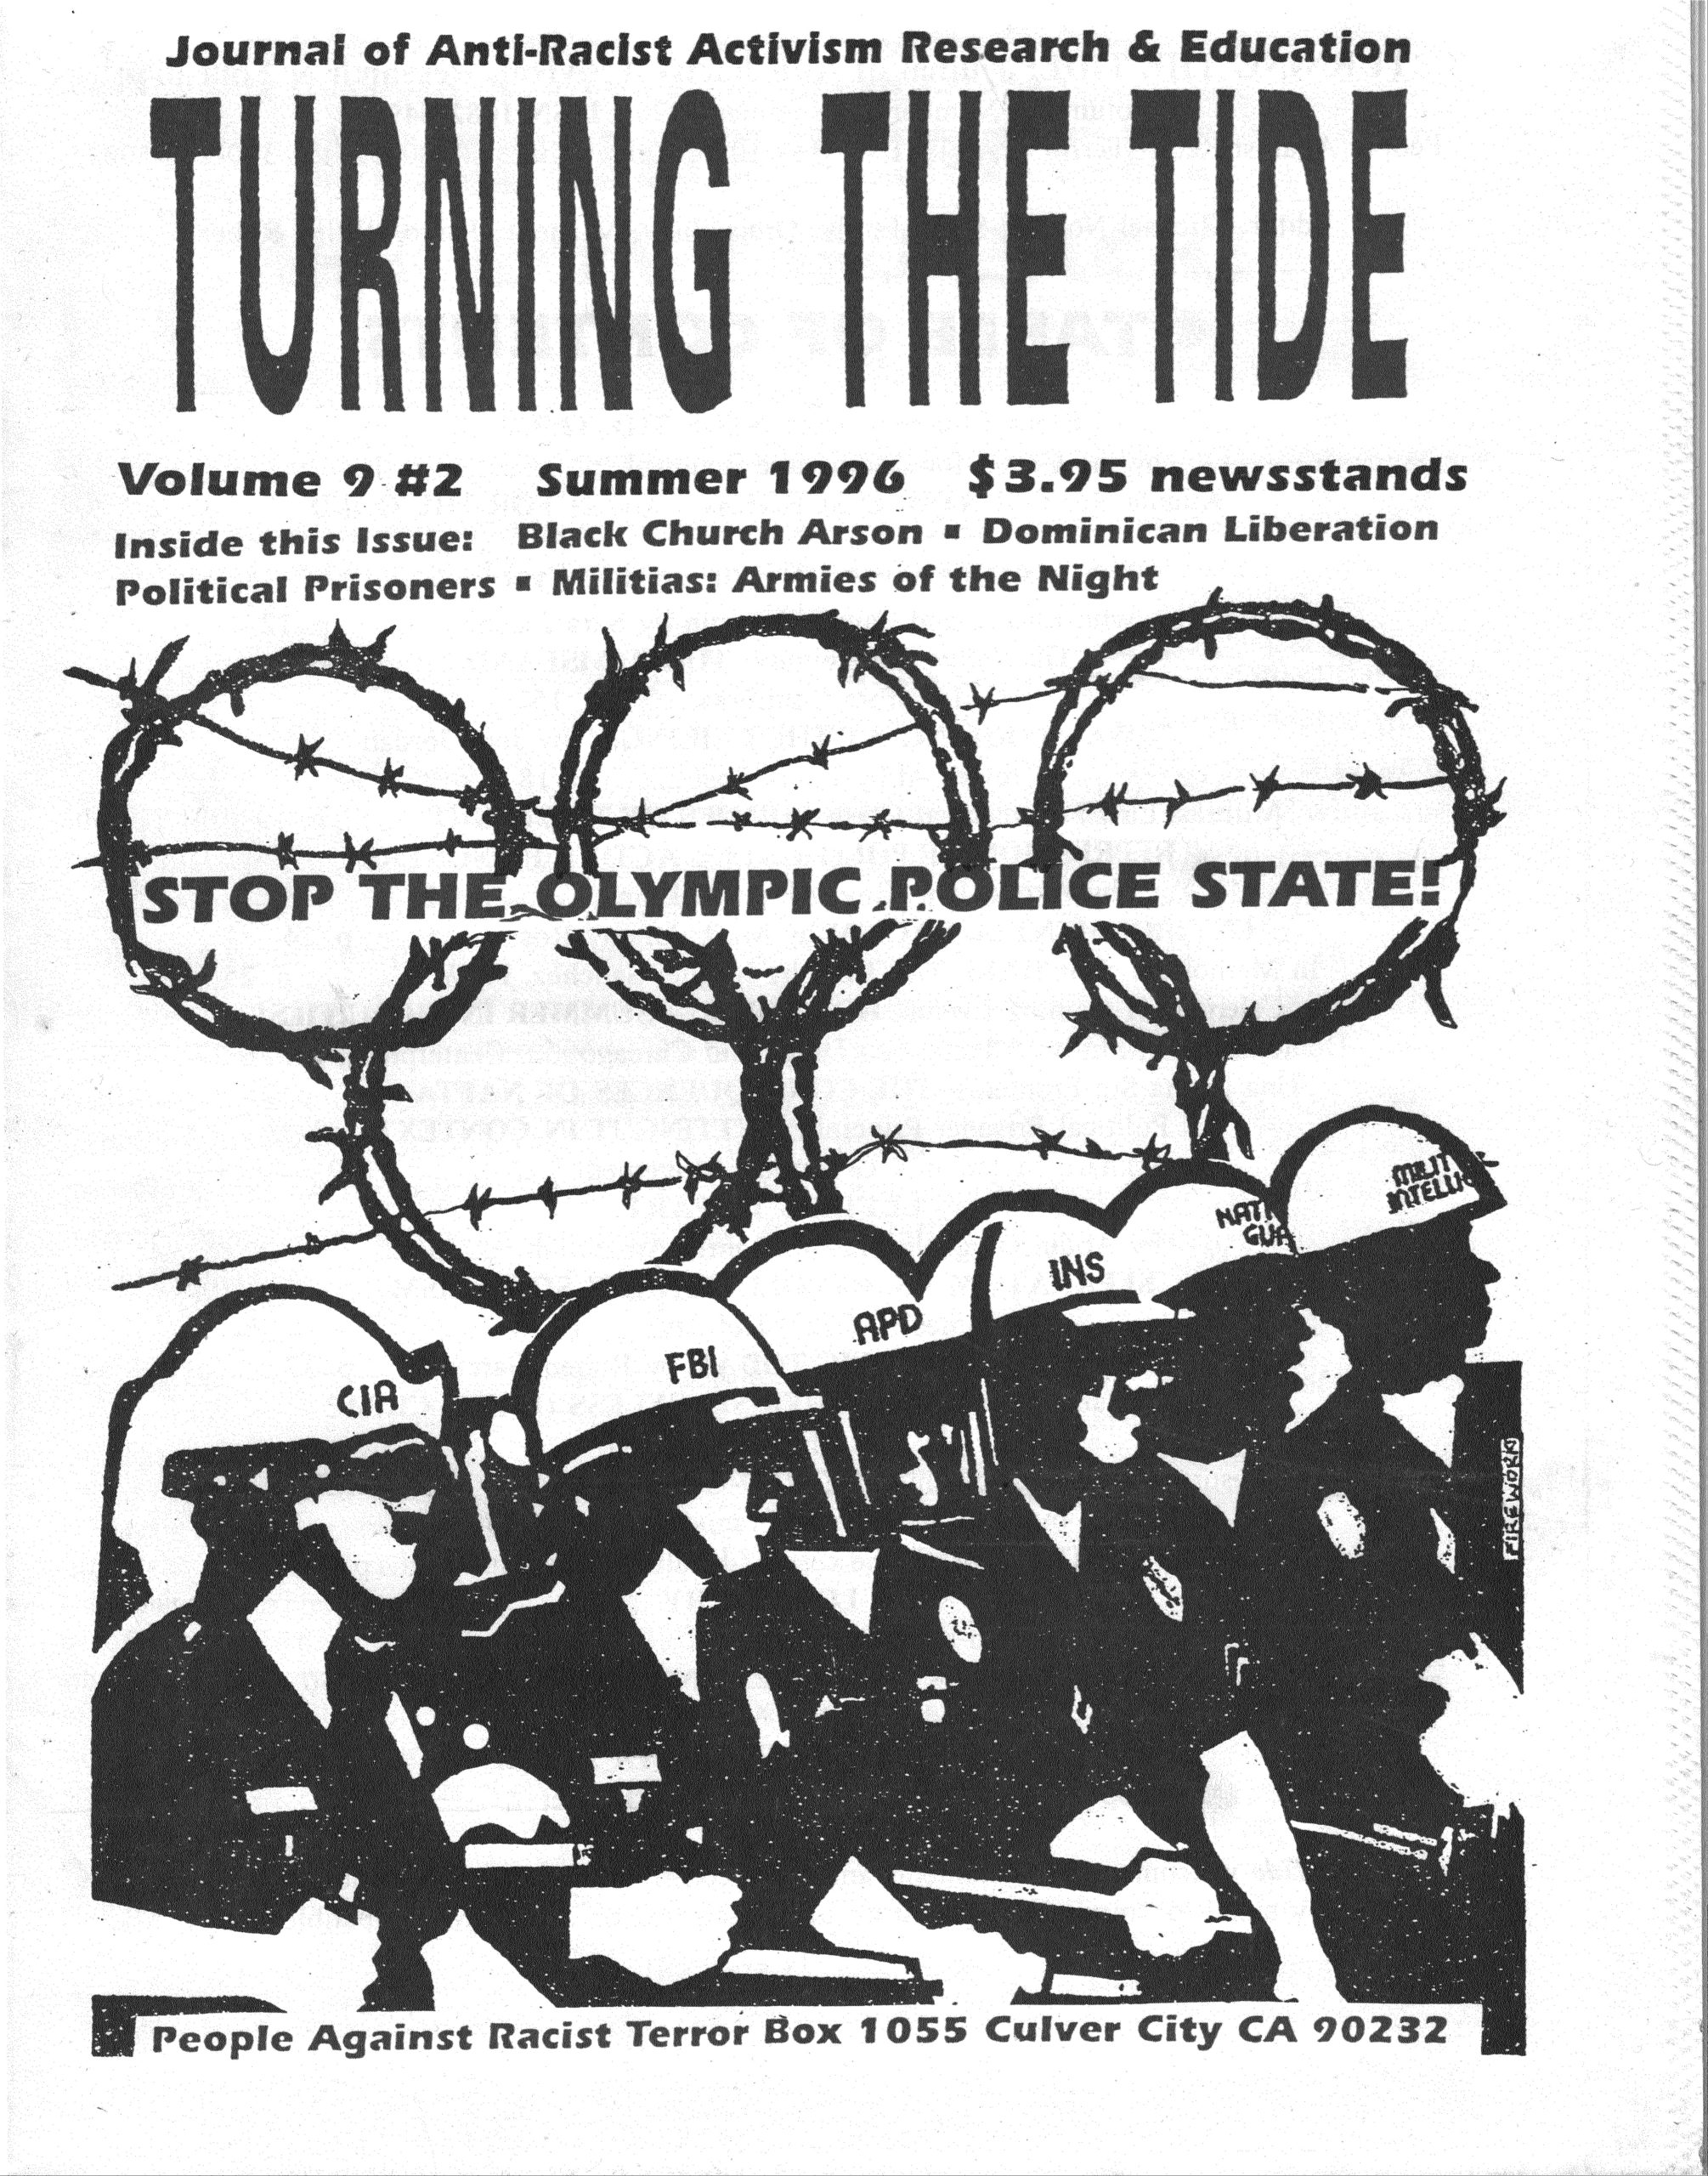 TTT Vol. 9 #2 Summer 1996